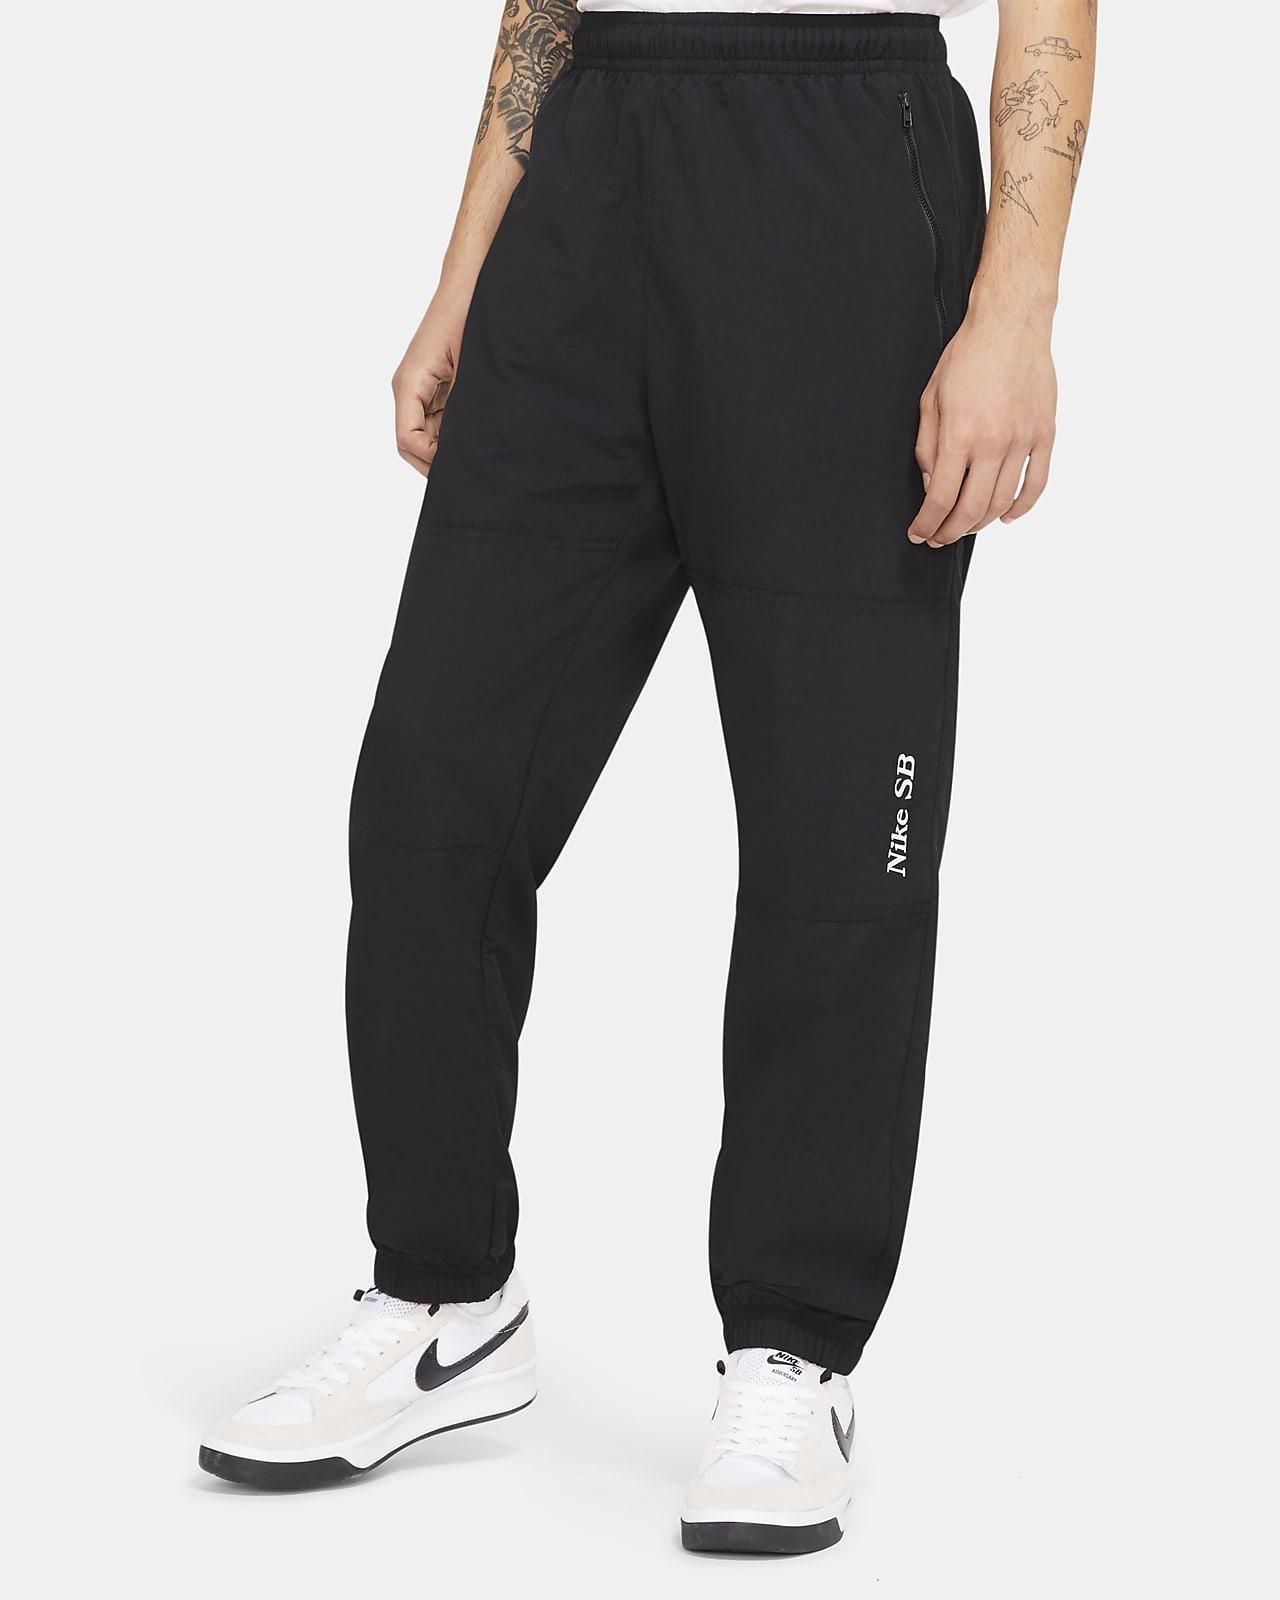 Pantalones de skateboarding con estampado gráfico Nike SB